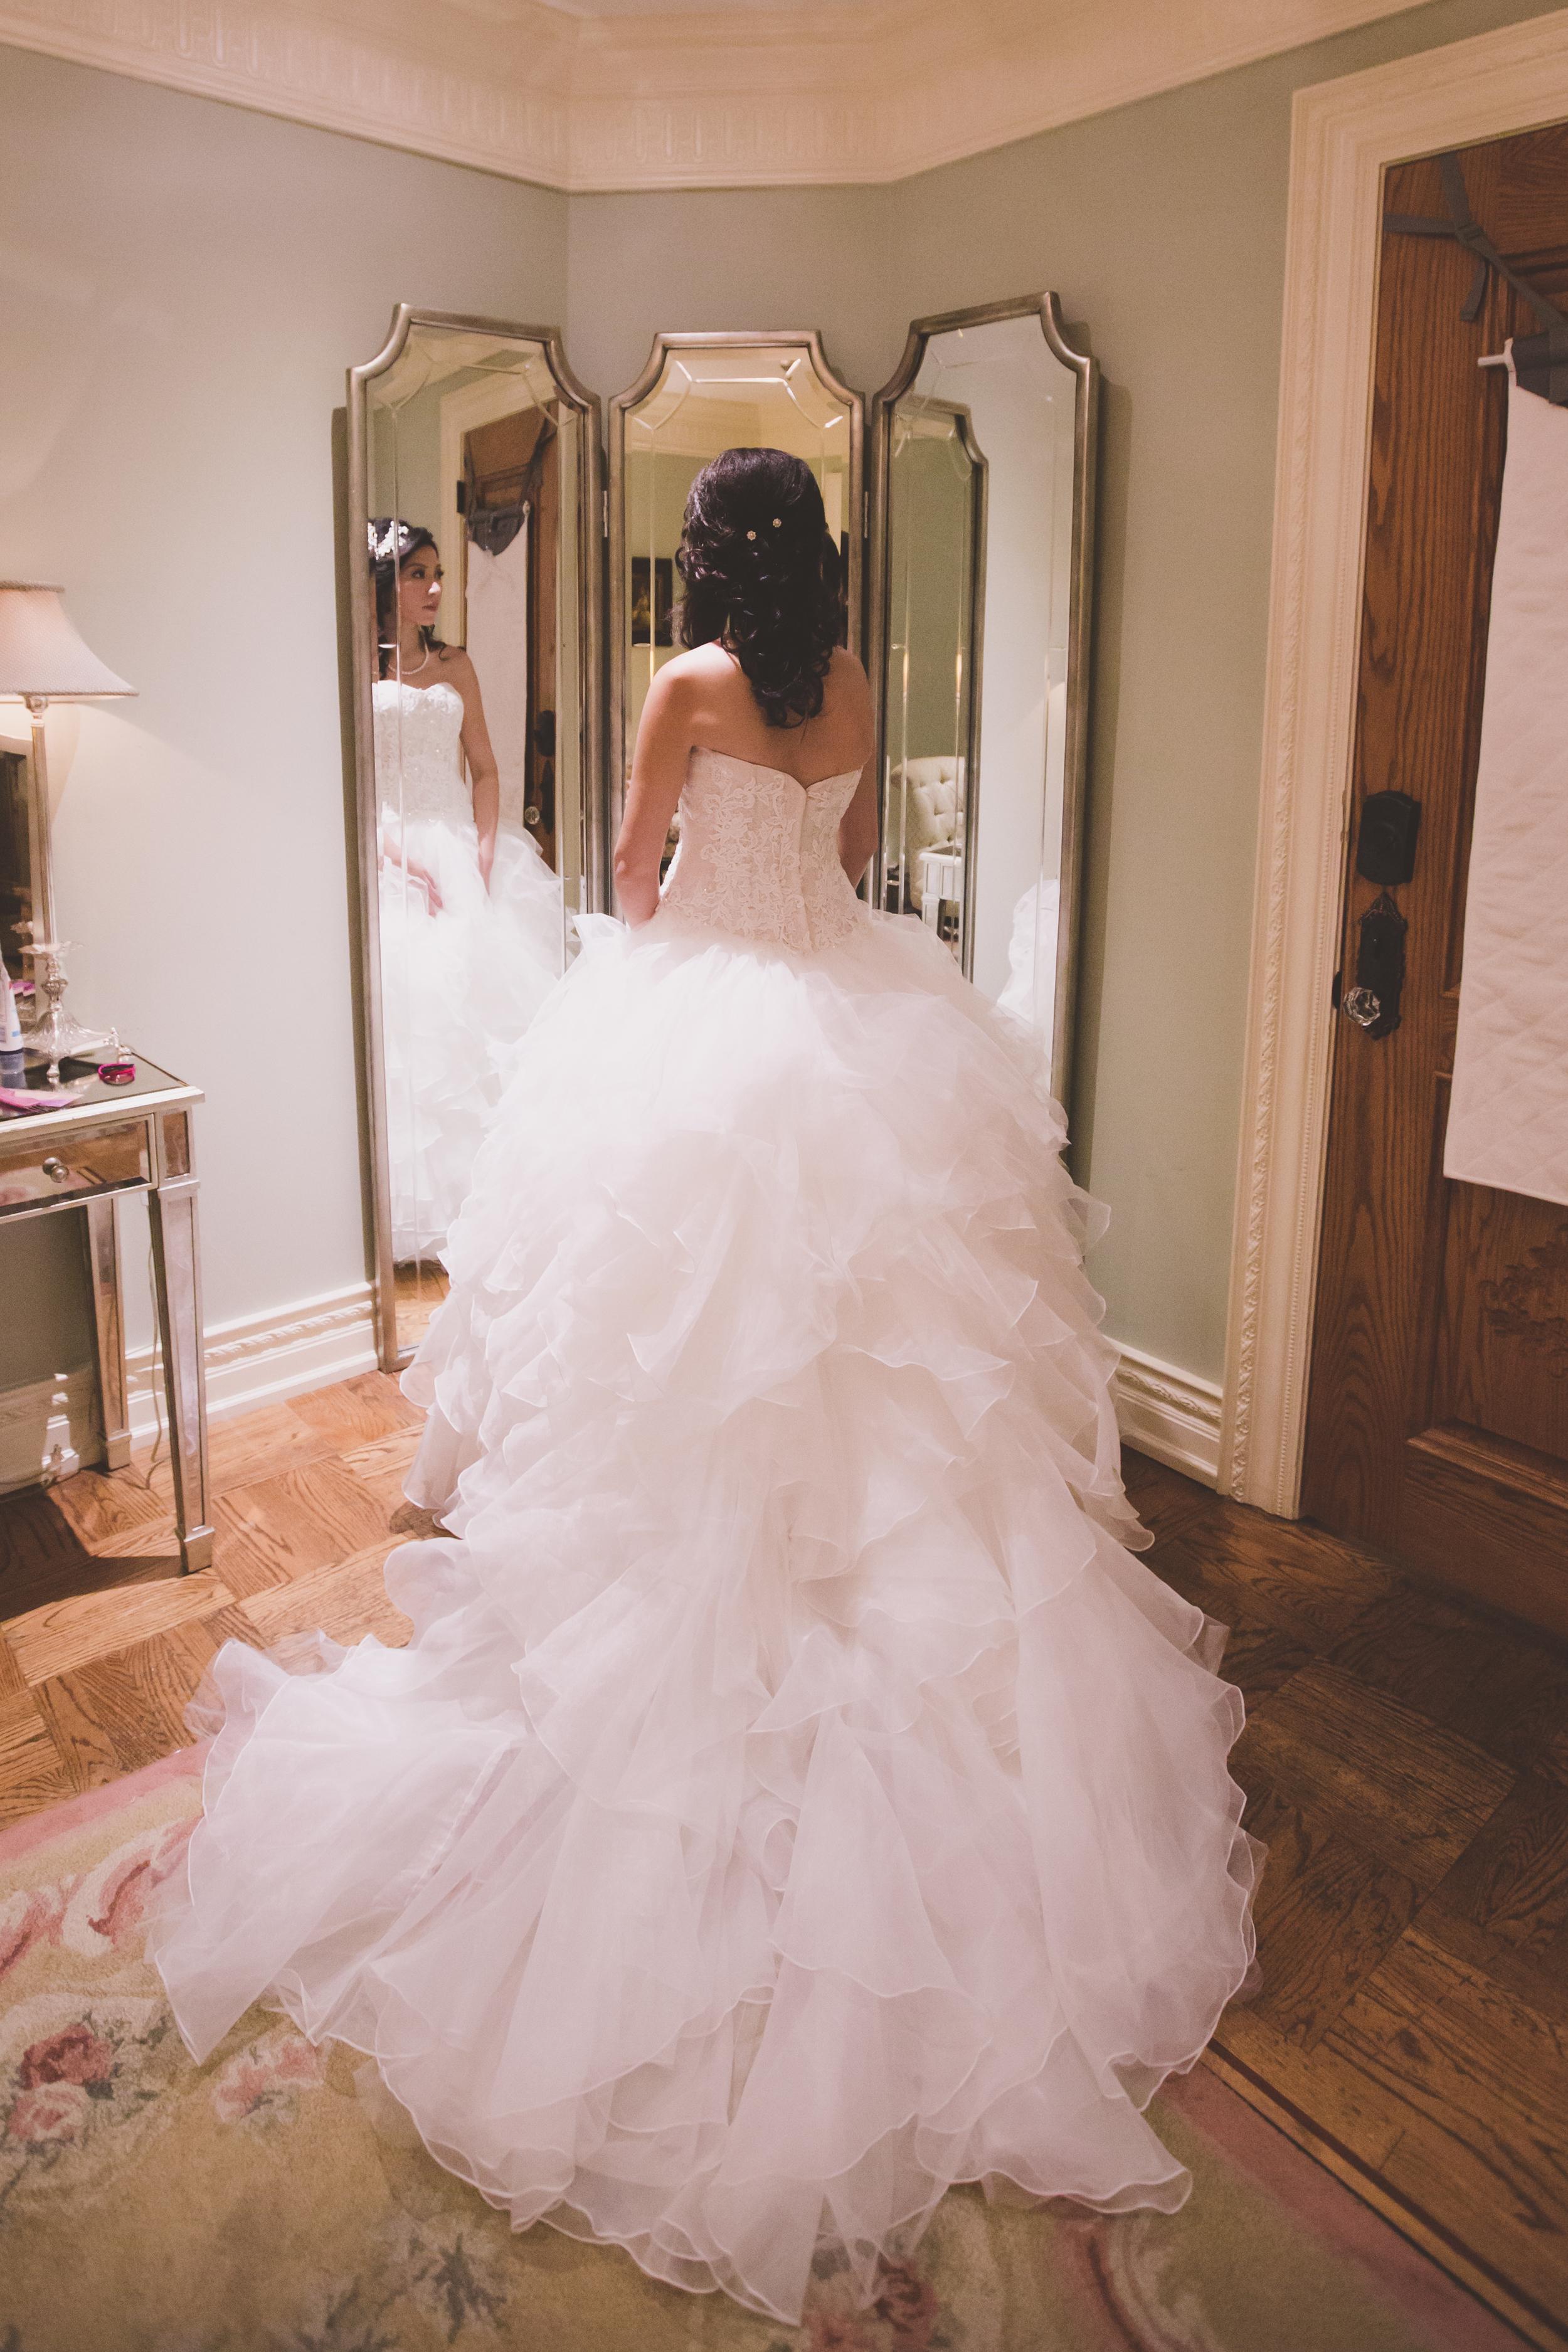 cupcake princess wedding dress getting ready